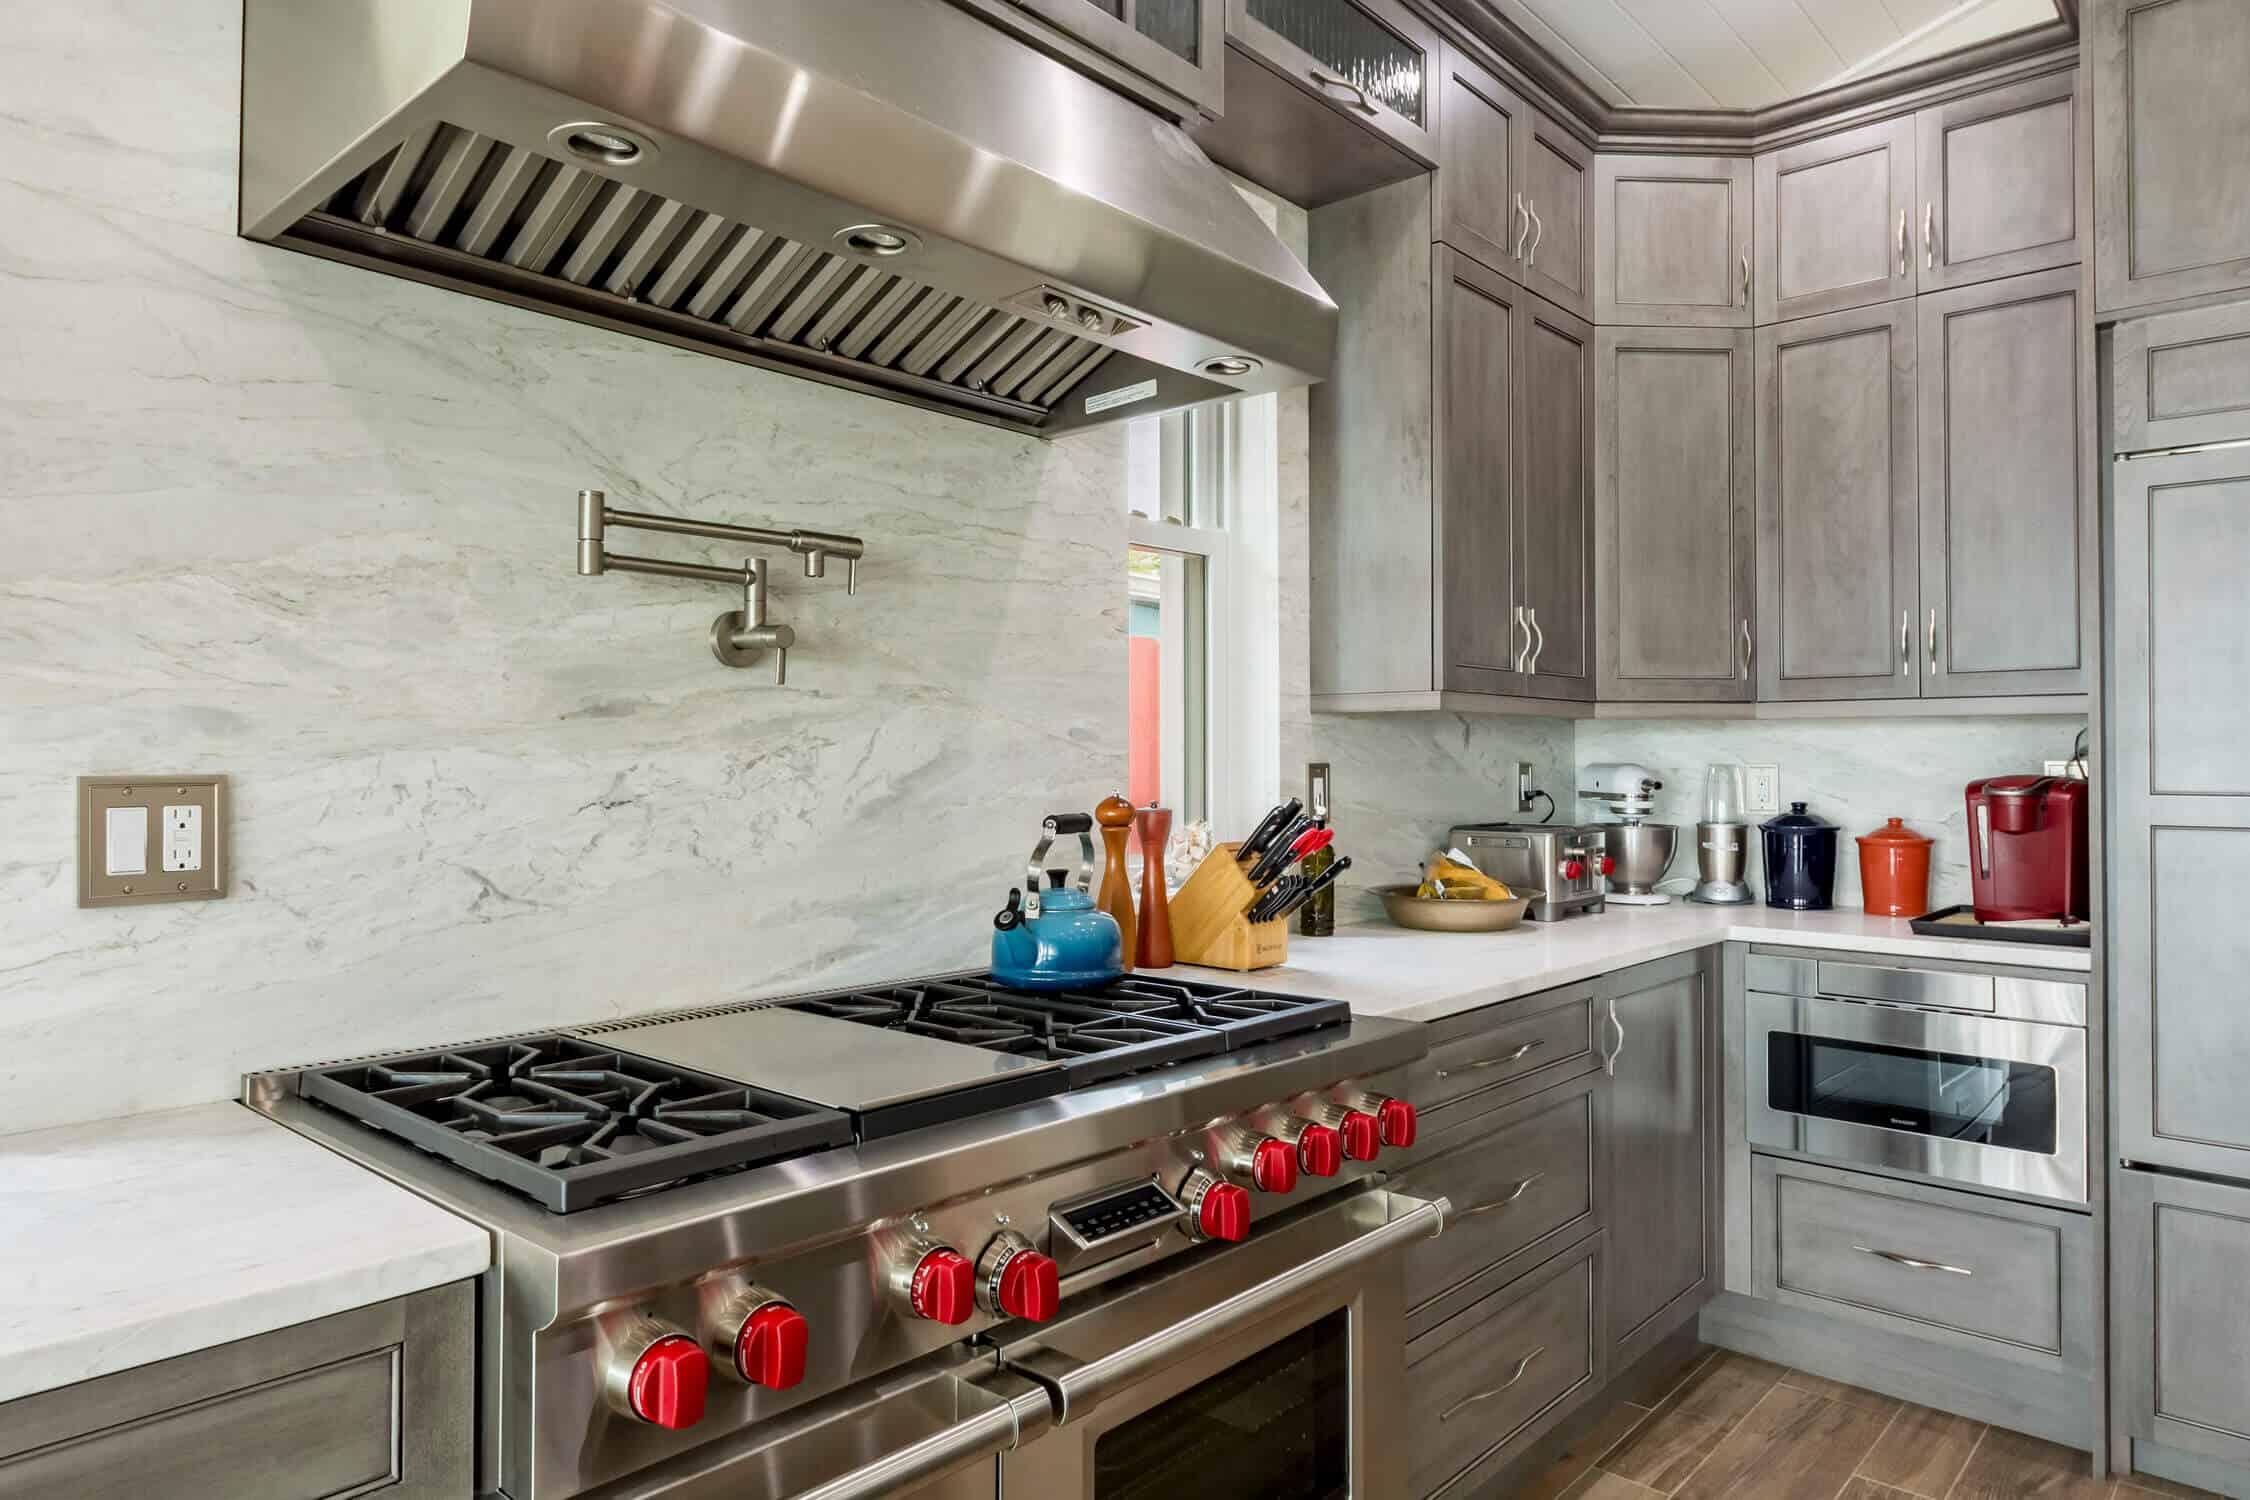 Kitchen Remodel featuring Marble Backsplash